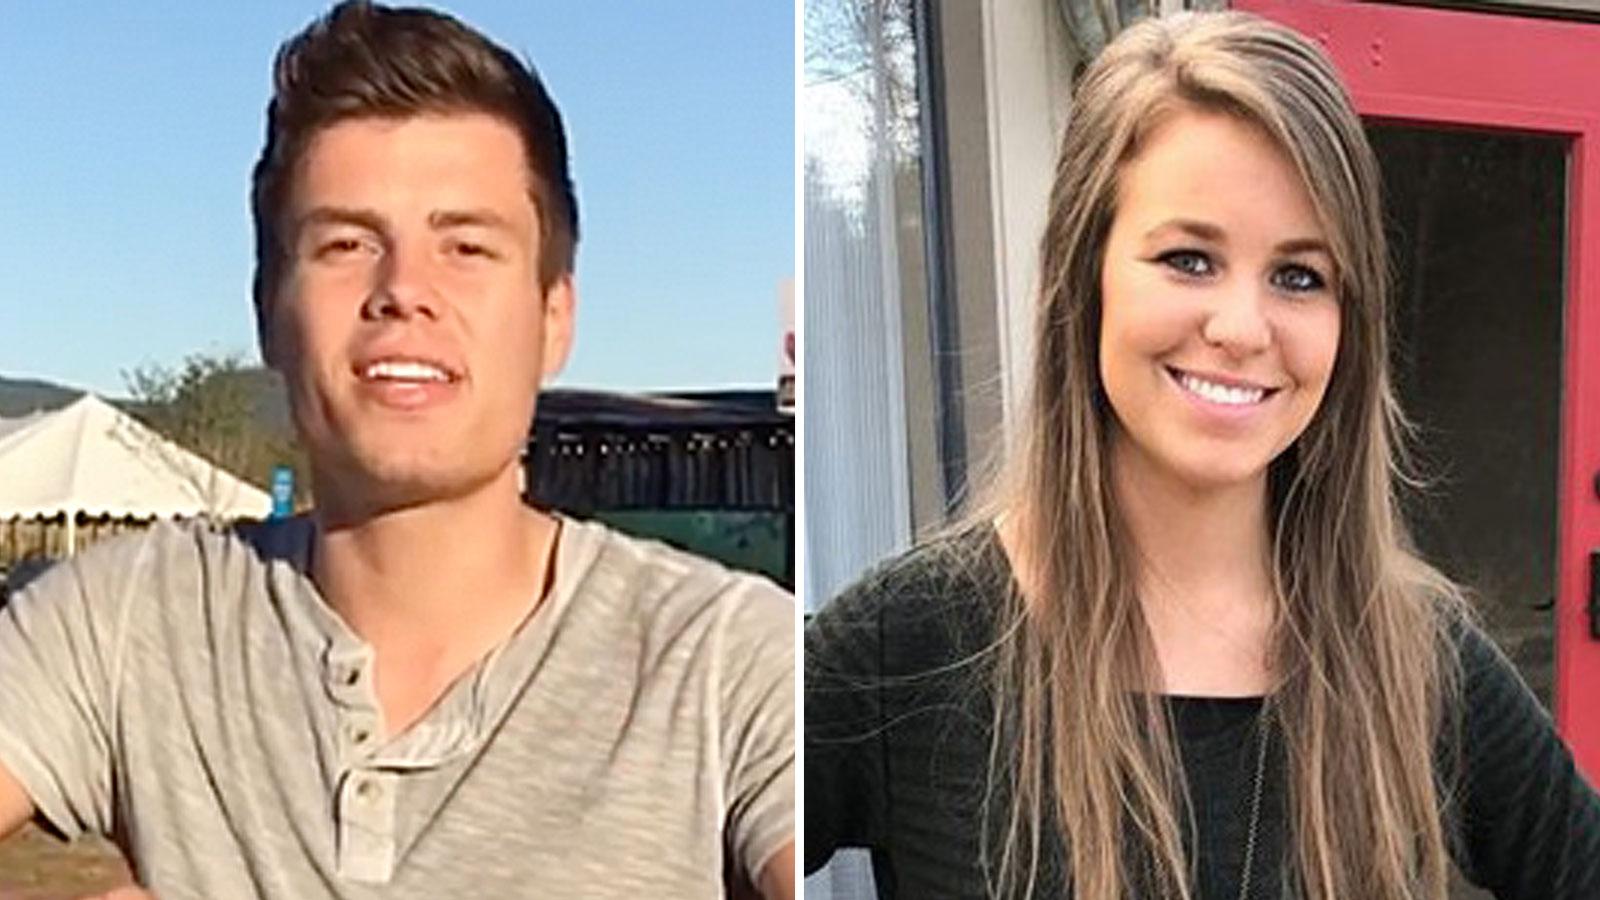 Duggars dating Bates Tiffany SNSD rykten dating